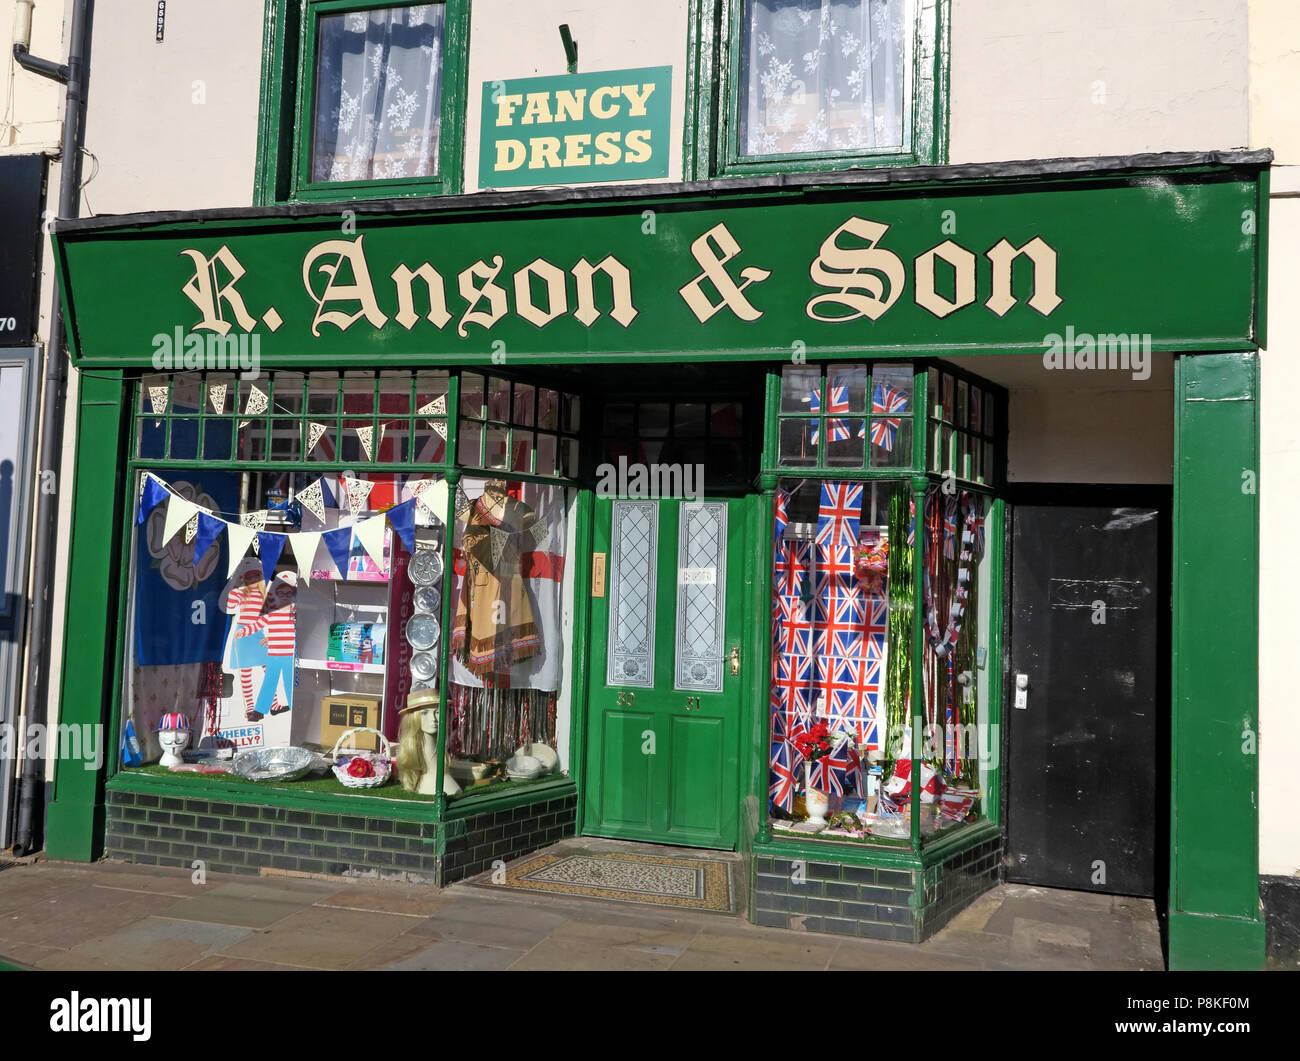 @HotpixUK,GoTonySmith,Anson,fancy Dress Shop,Yorkshire,UK,Shop,30-31,South Yorkshire,GB,shop,shopping,problem,decline,green,shop front,joke,joke shop,costume,costumes,shopfront,donny,independent,independent shop,30 Market Place,Market Place,Market Place Doncaster,Fancy,dress,shop,in,Doncaster,Fancy dress,in,Doncaster,DN1,R Anson,Costume,Hire,in,Doncaster,Costume Hire Doncaster,Costume Hire